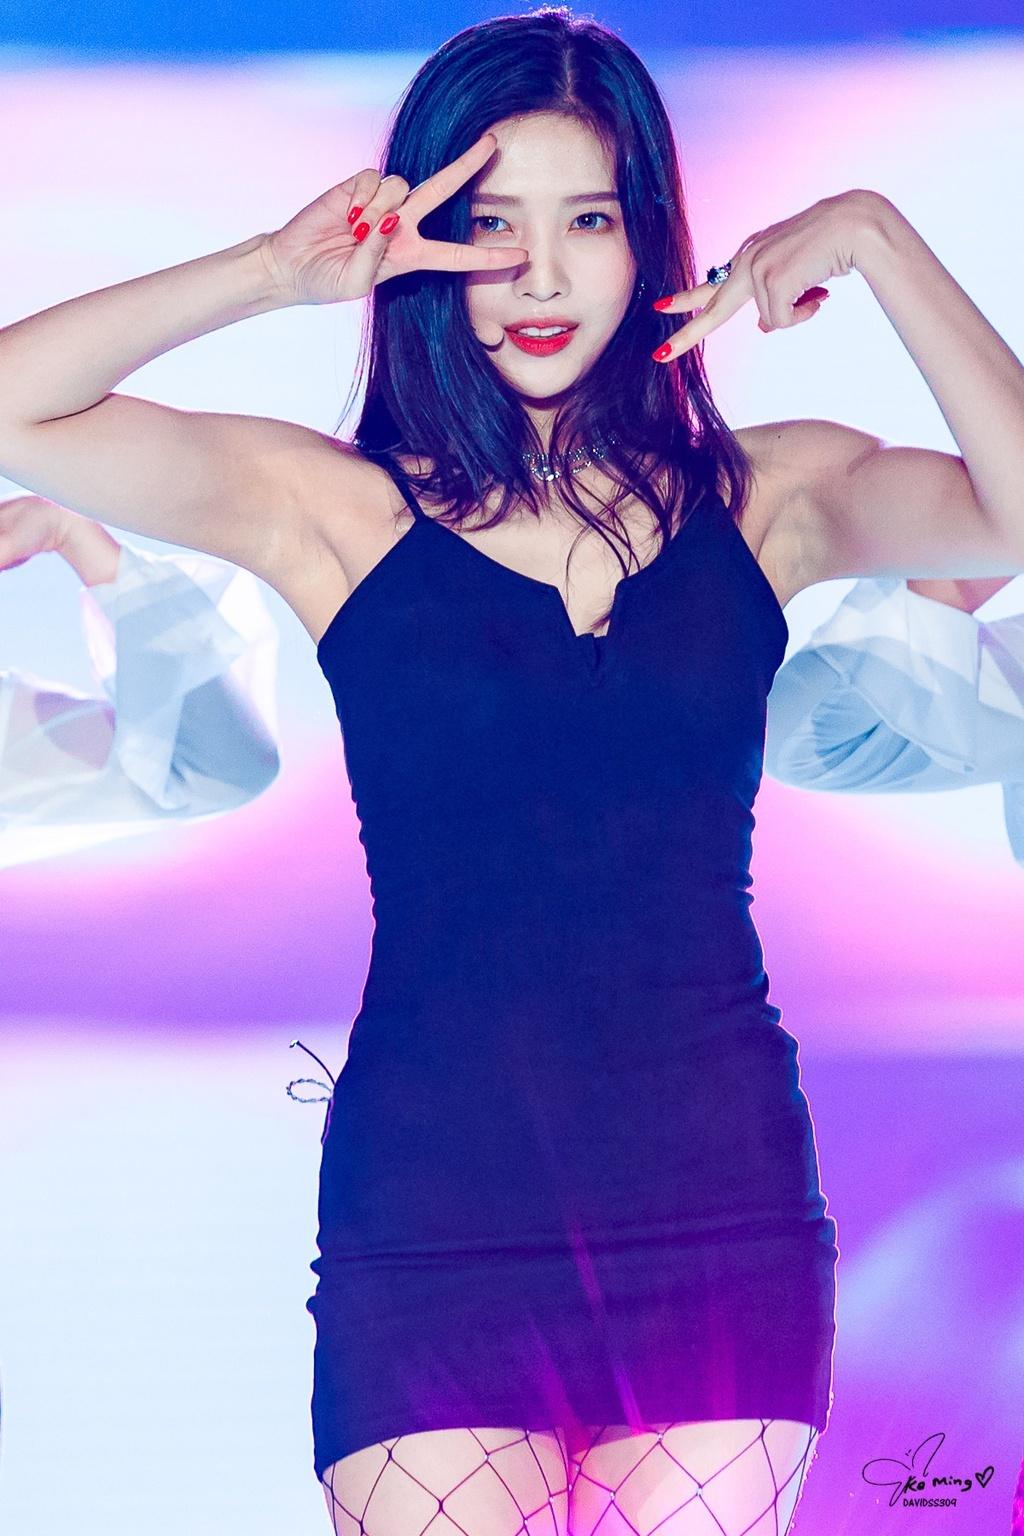 Thanh vien Red Velvet duoc khen dep nhu bup be hinh anh 6 joy55.jpg